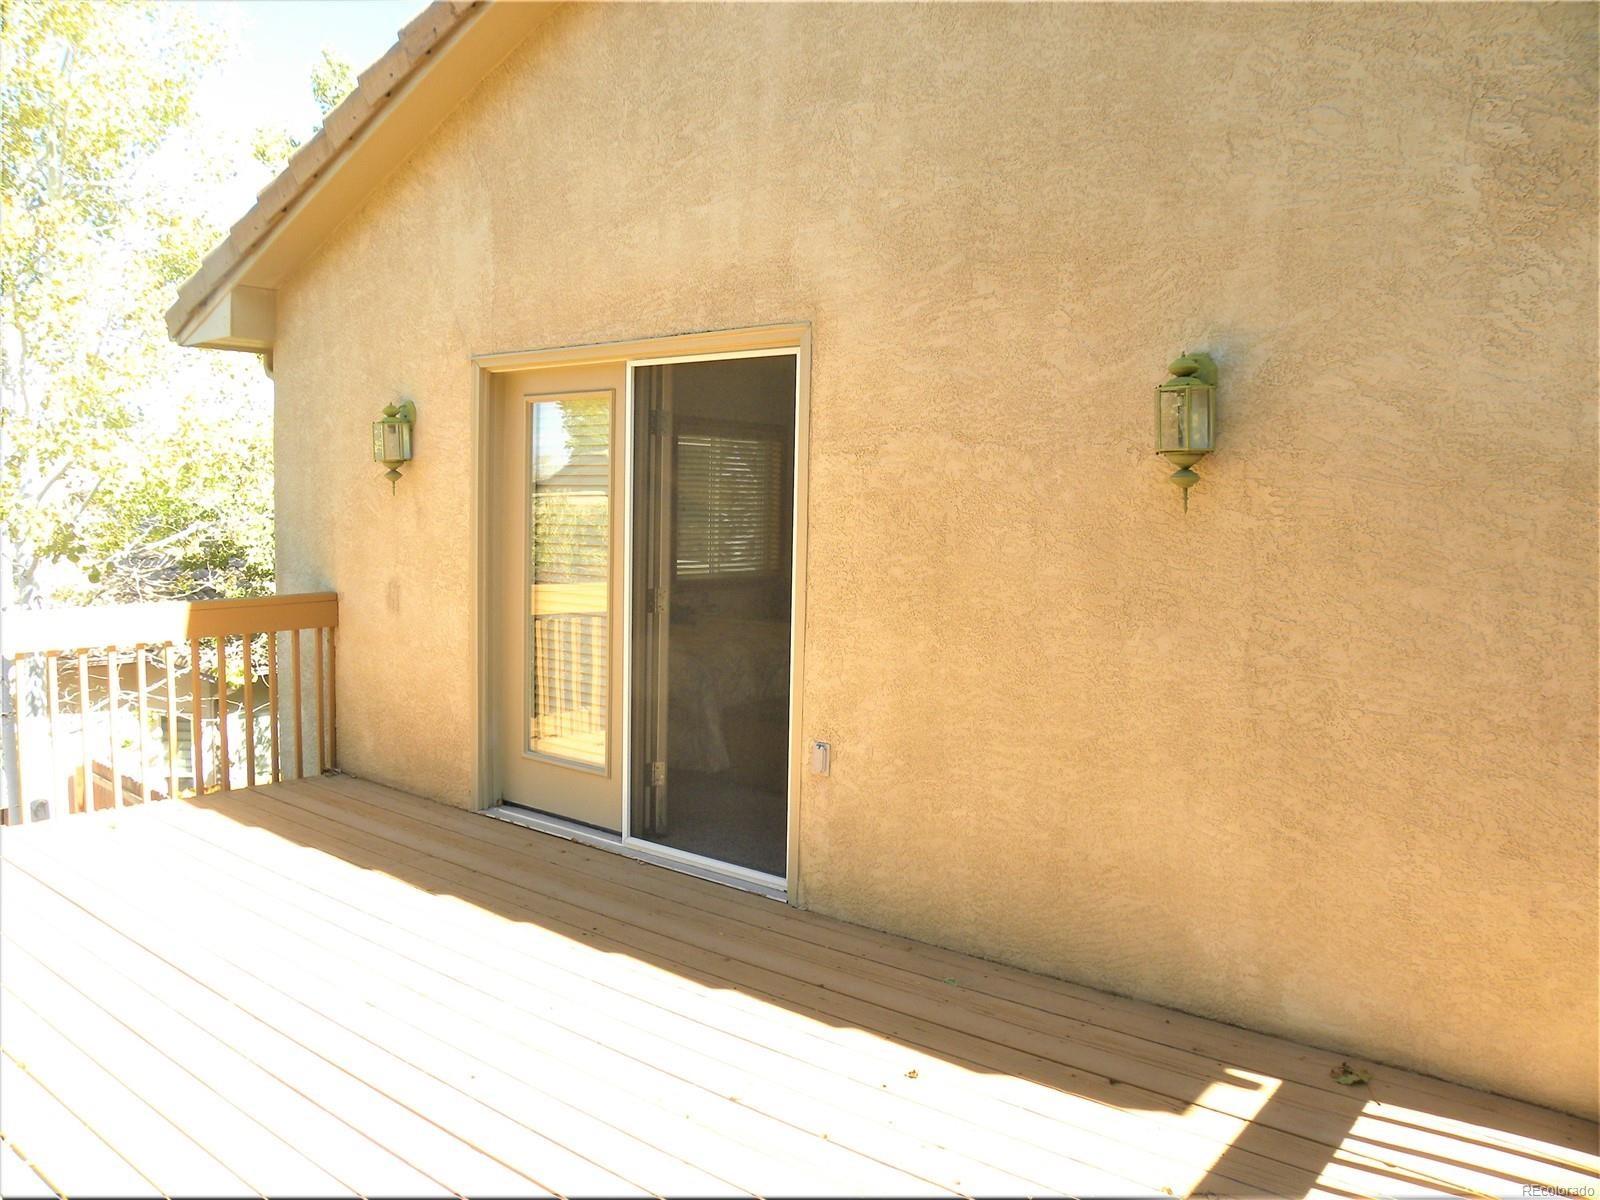 MLS# 5924977 - 24 - 1017 Cedarcrest Drive, Pueblo, CO 81005